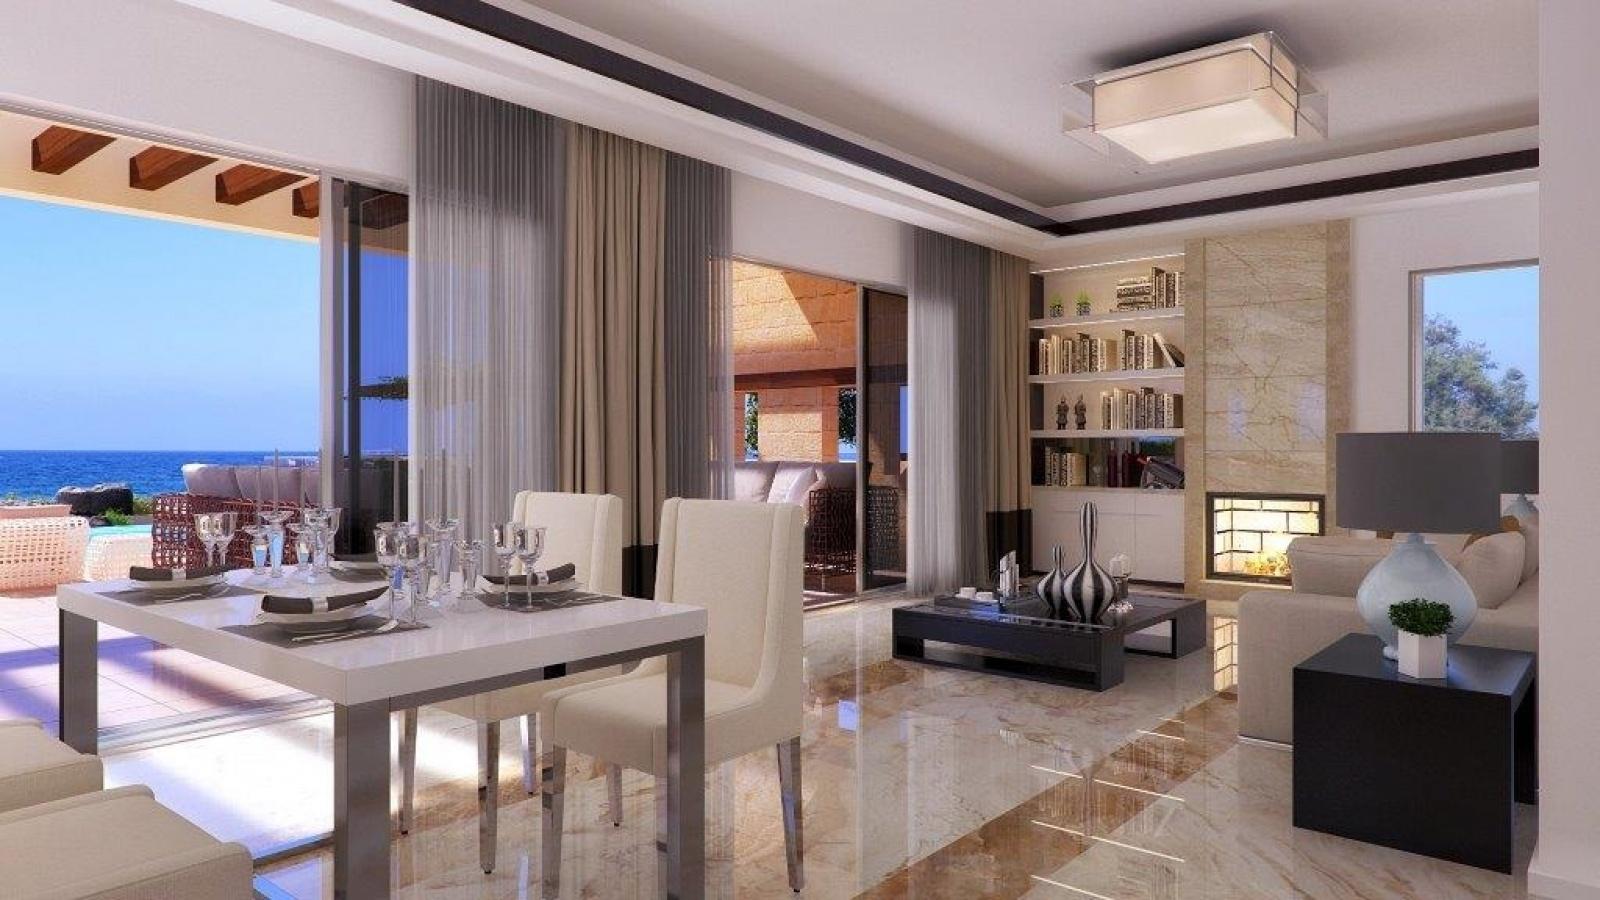 Residential Bungalow - Beach Villas/Bungalows FOR SALE